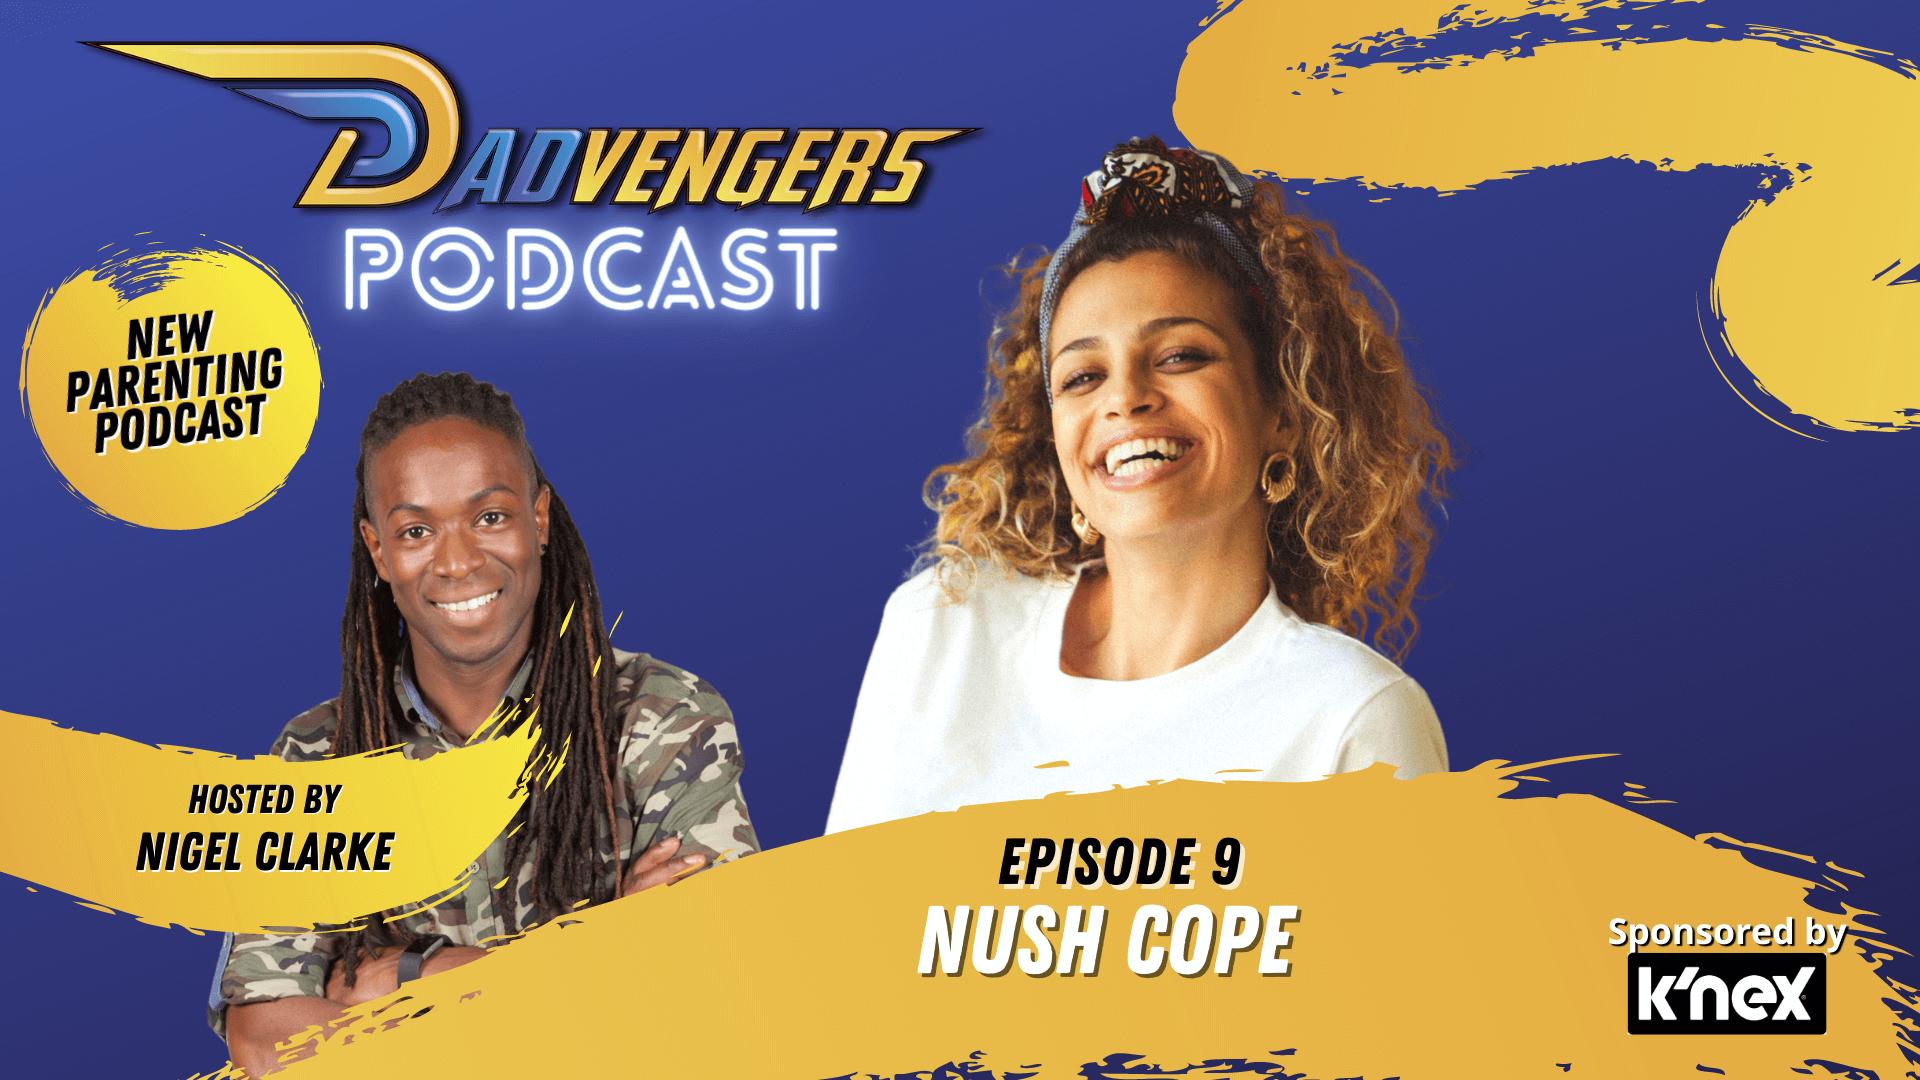 Dadvengers Podcast Ep 9 - Nush Cope